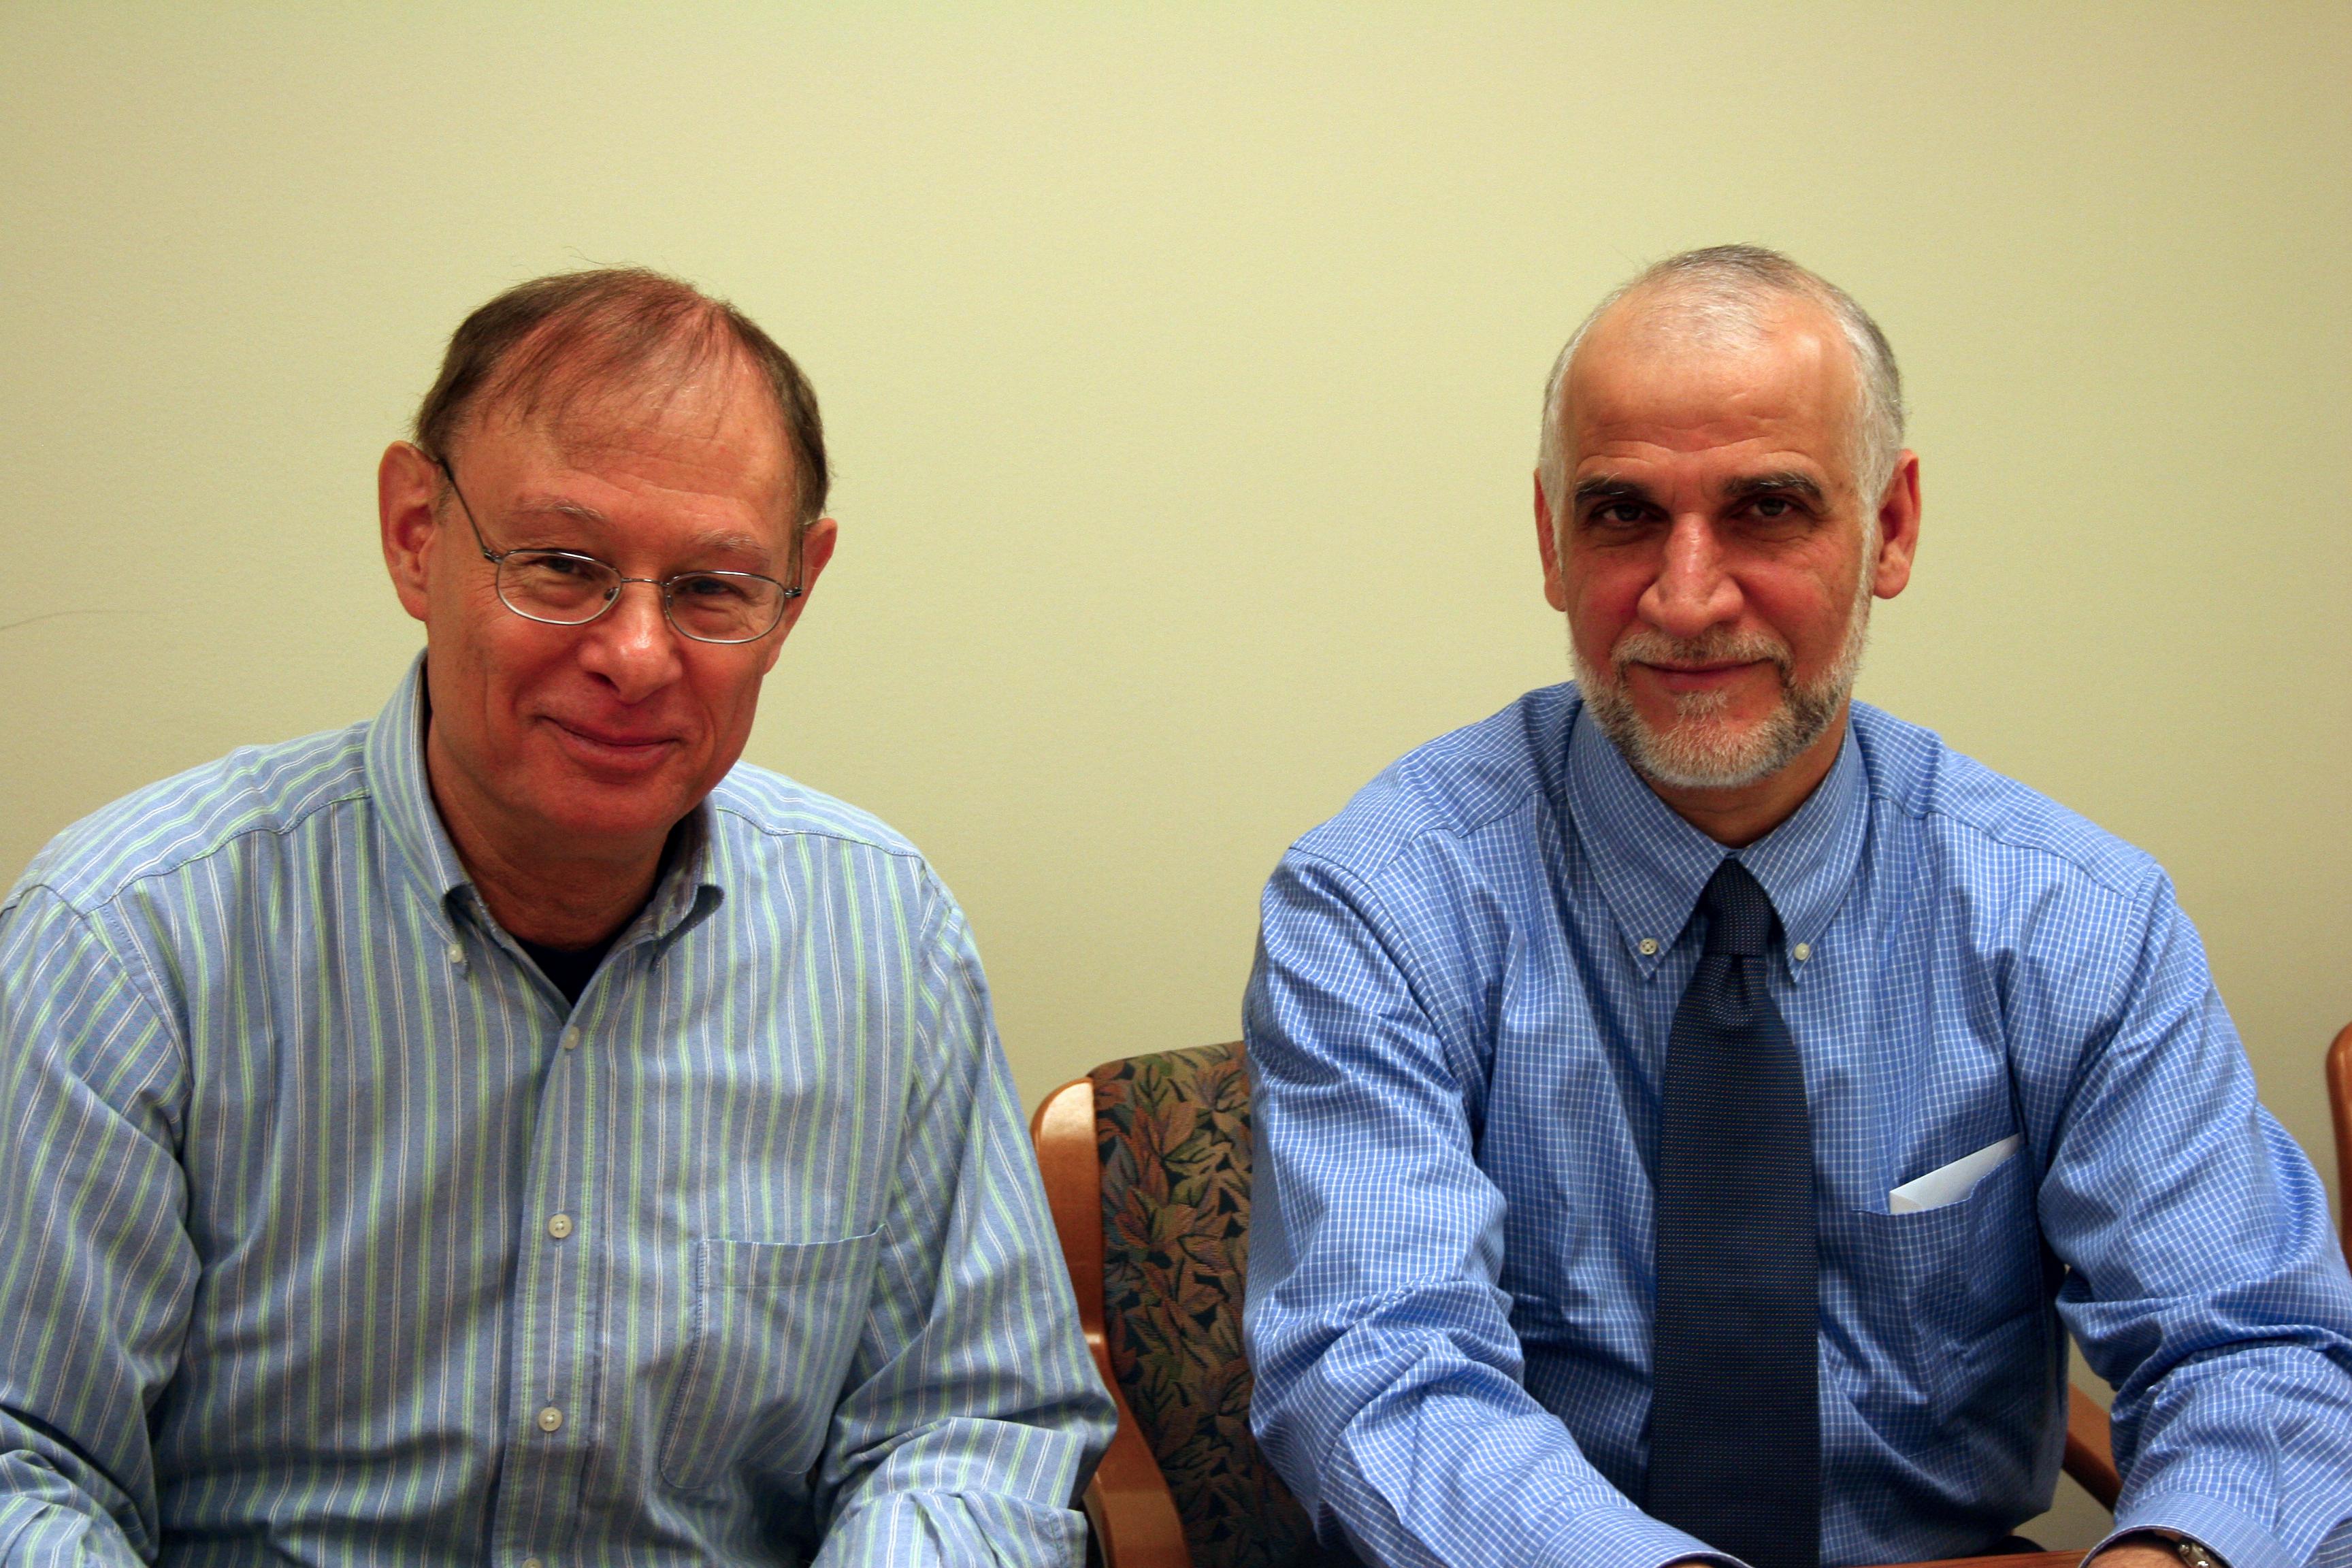 Mark Tessler (left) with SESRI director Darwish Al-Emadi.